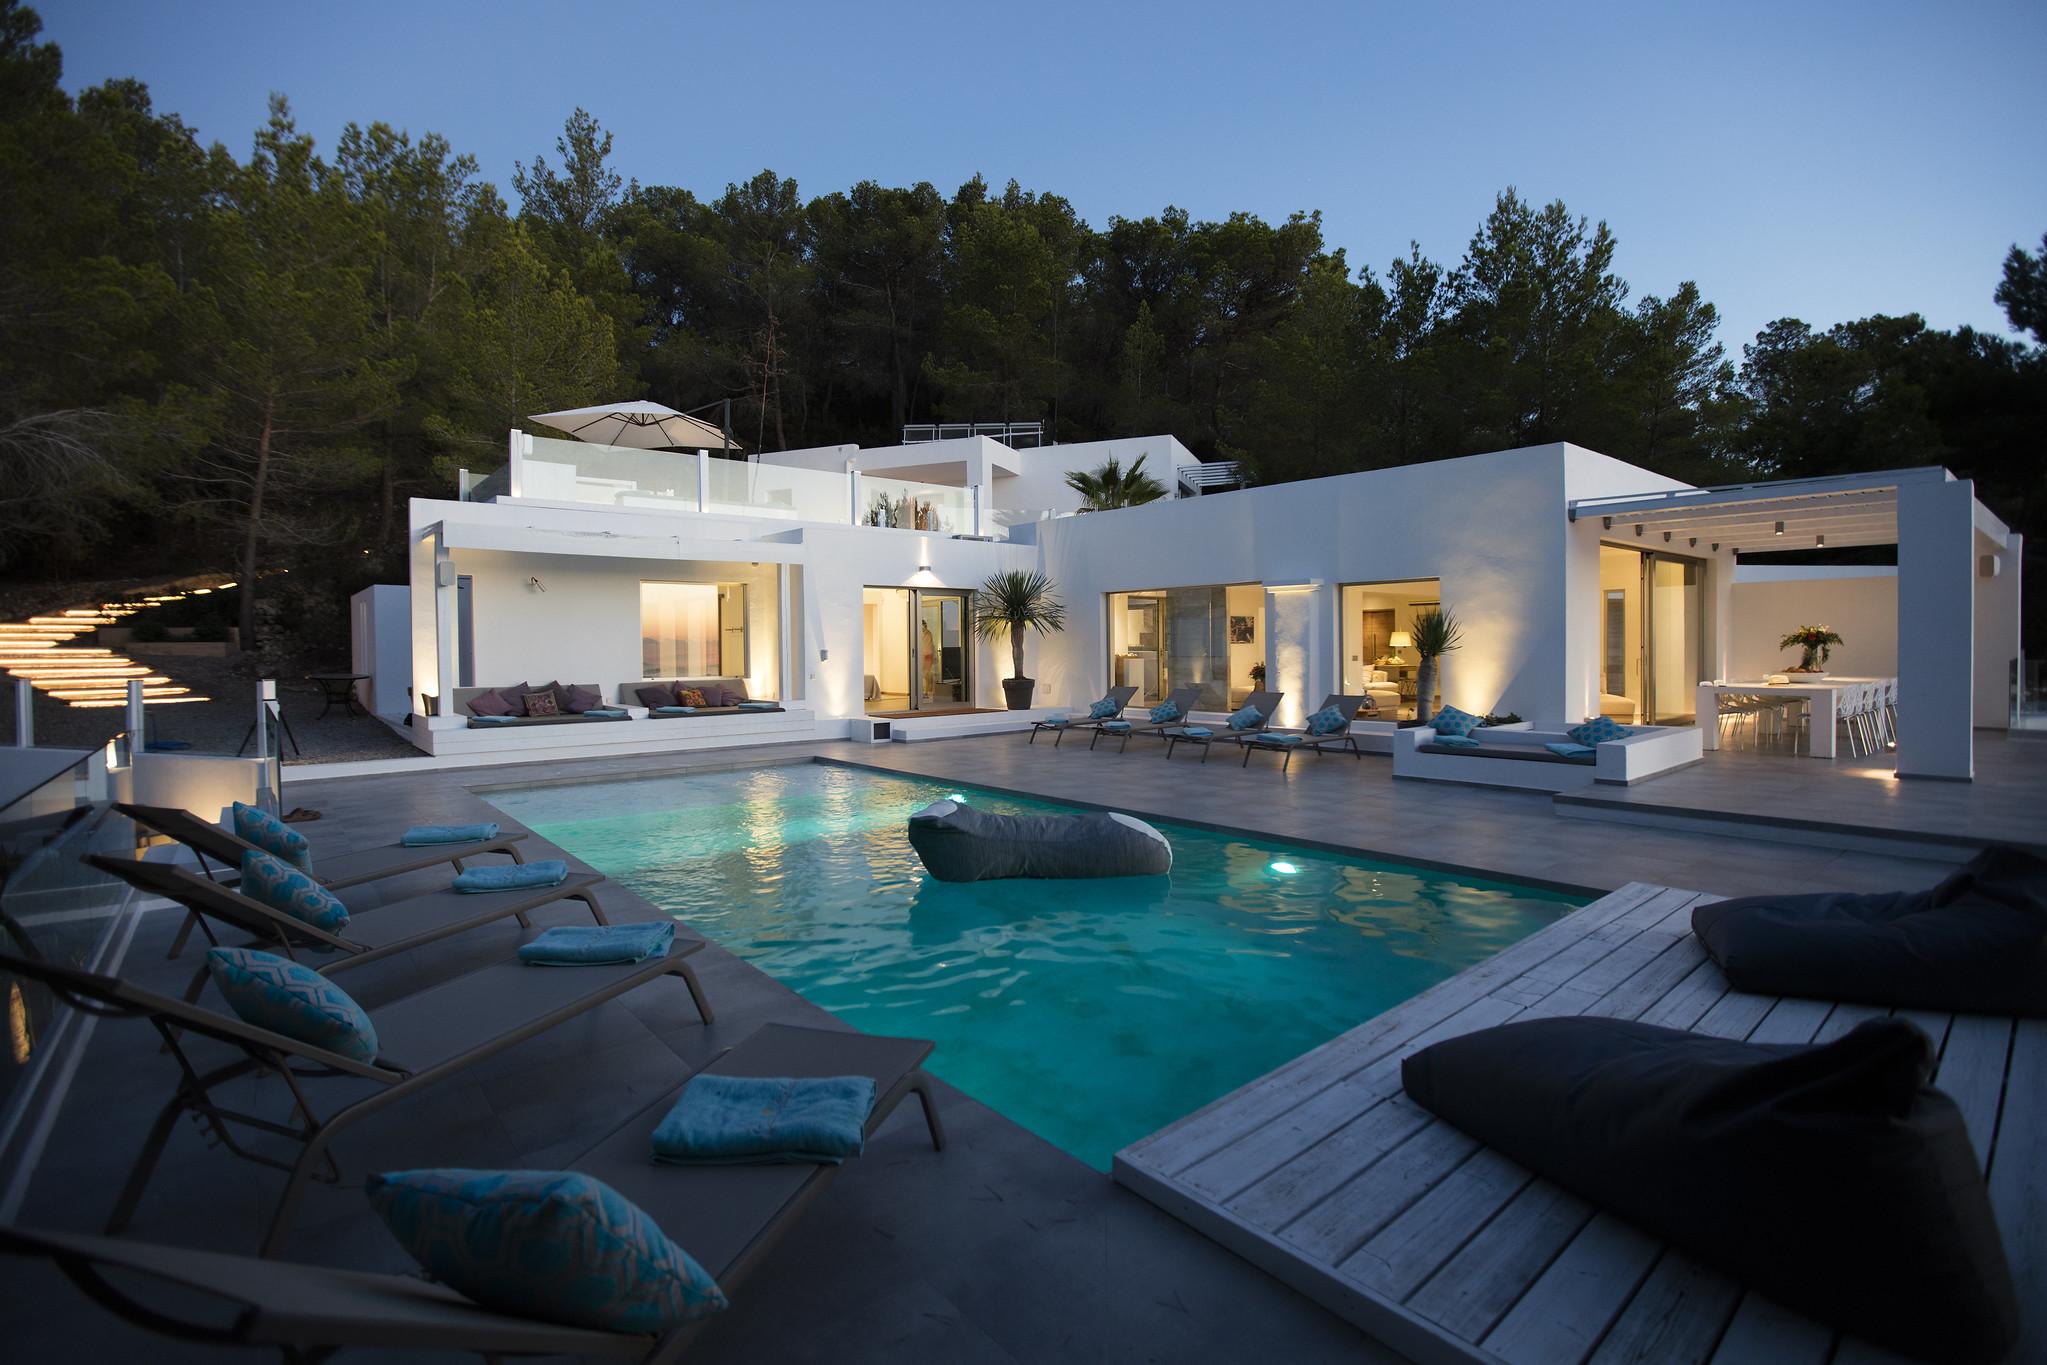 https://www.white-ibiza.com/wp-content/uploads/2020/05/white-ibiza-villas-can-dela-evening.jpg